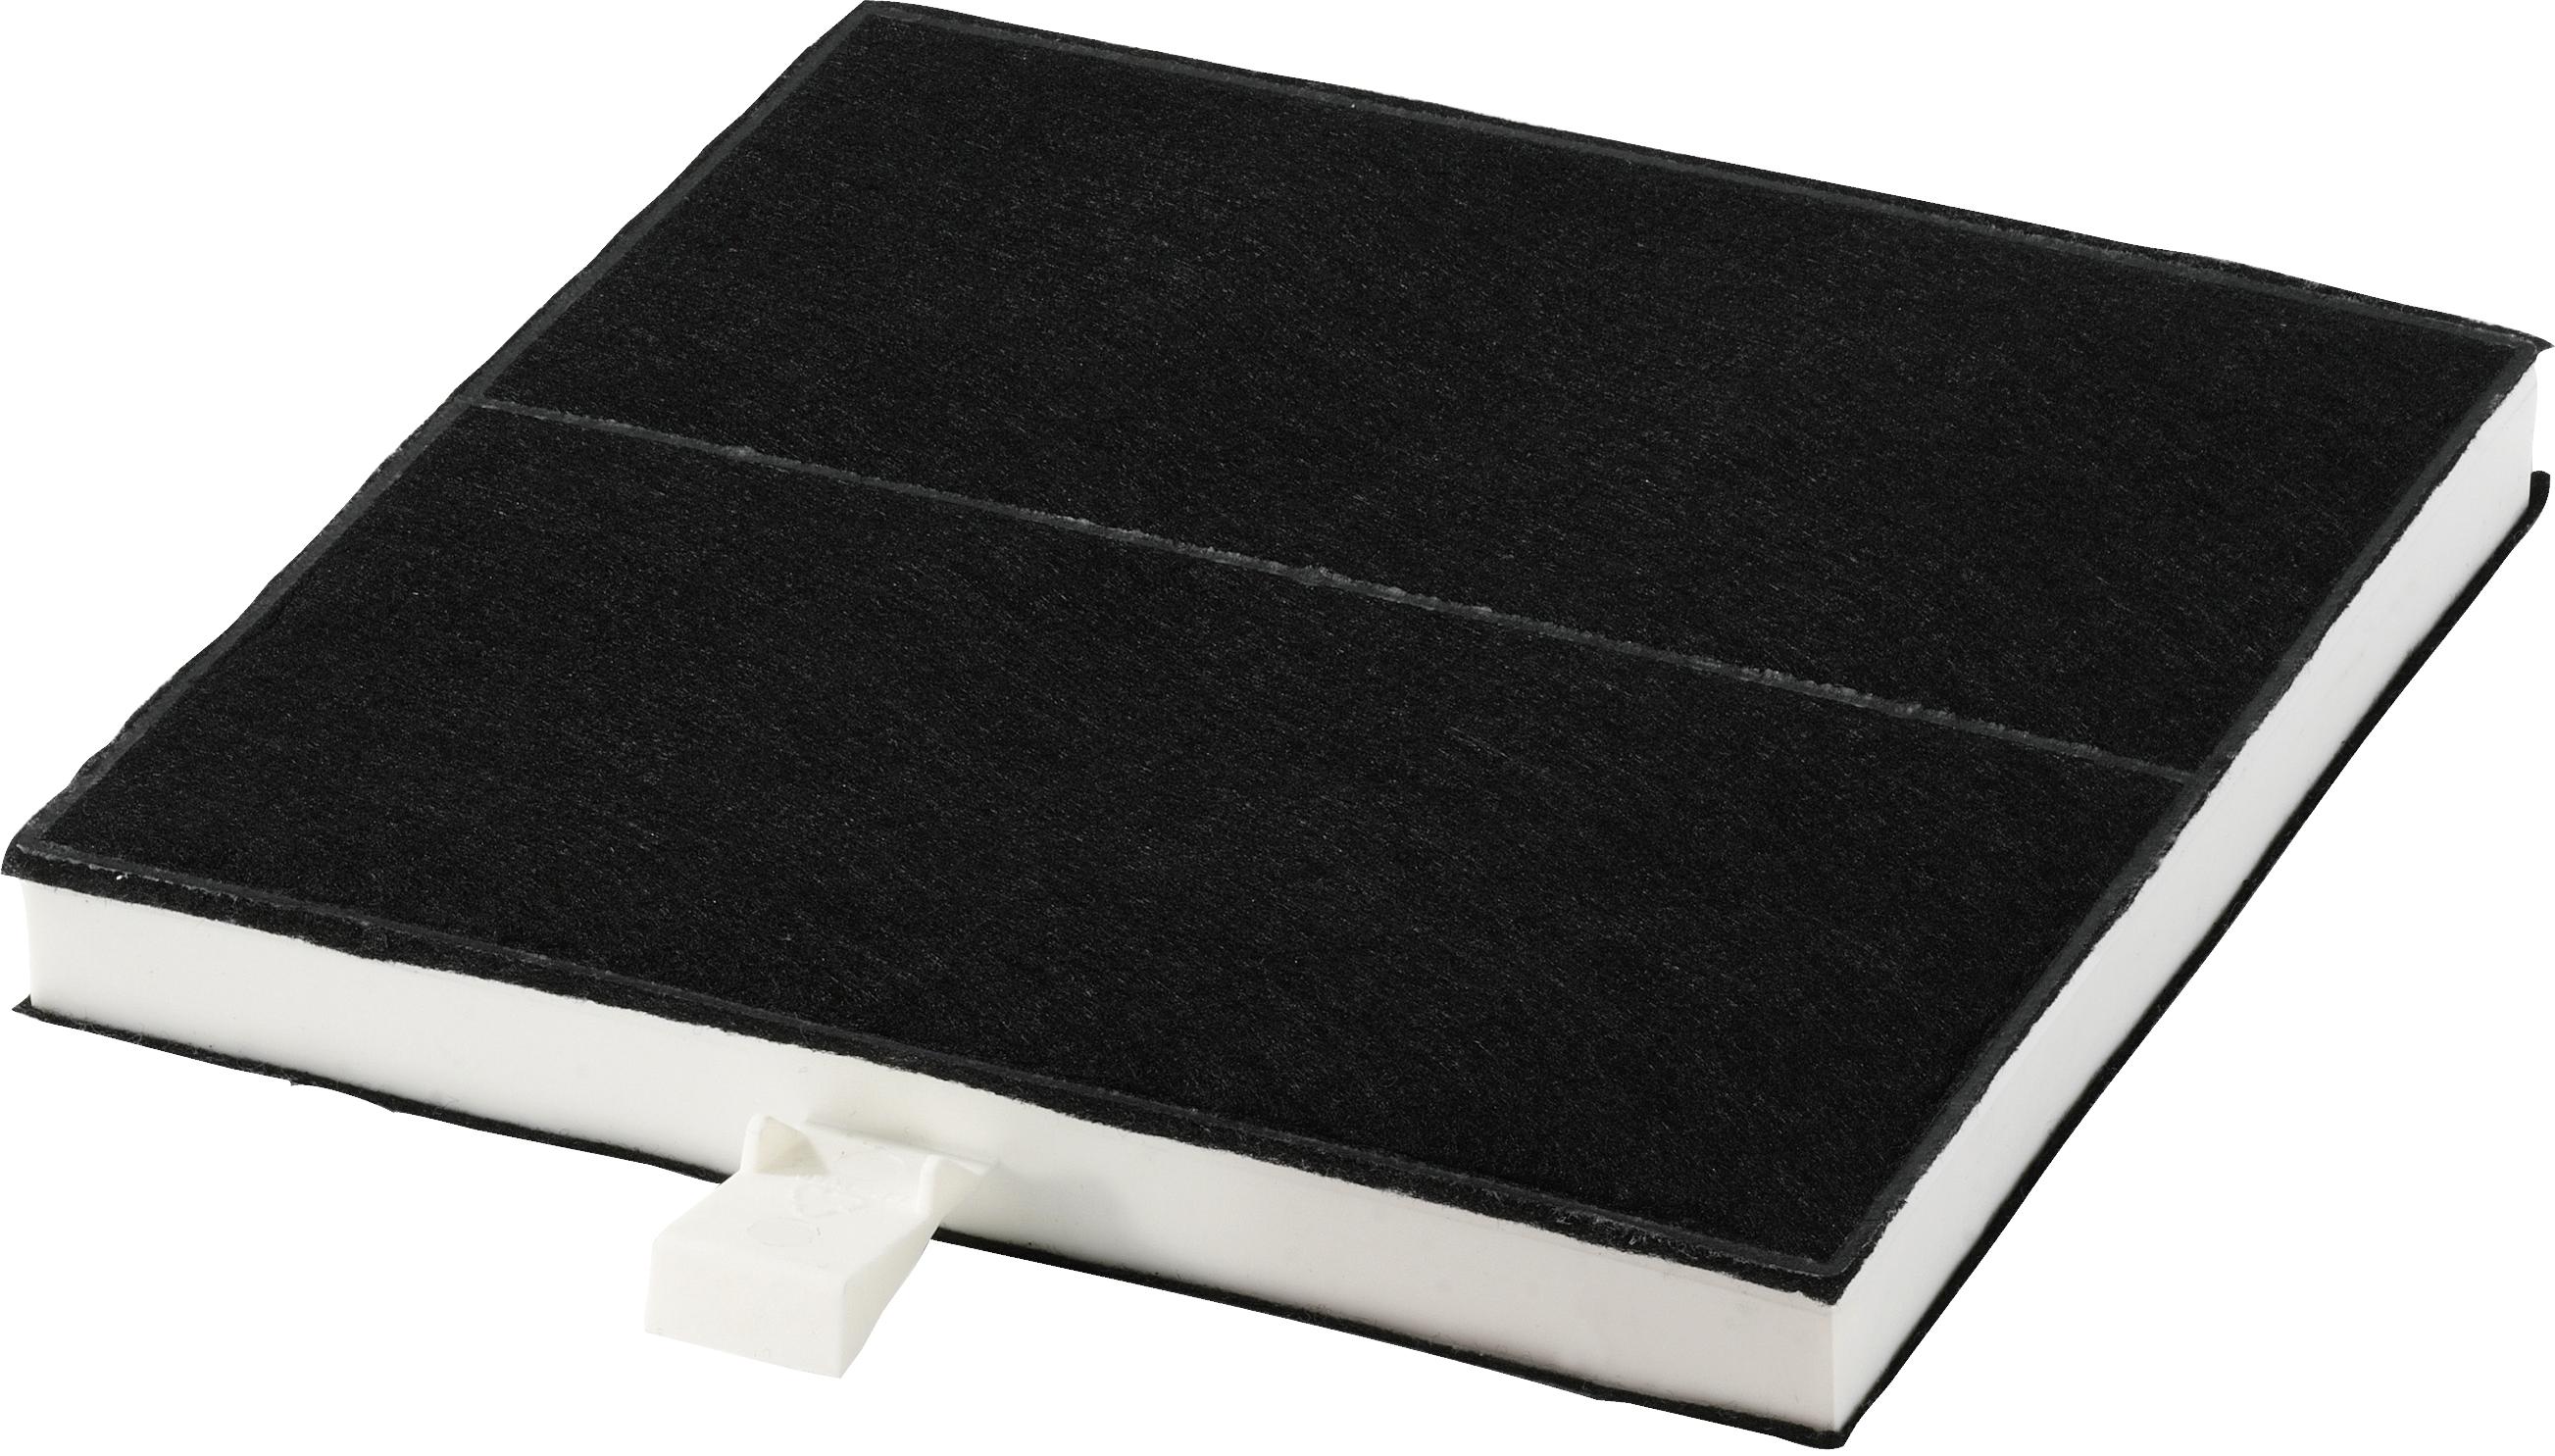 neff z5117x1 aktivkohlefilter ersatzbedarf no feature. Black Bedroom Furniture Sets. Home Design Ideas